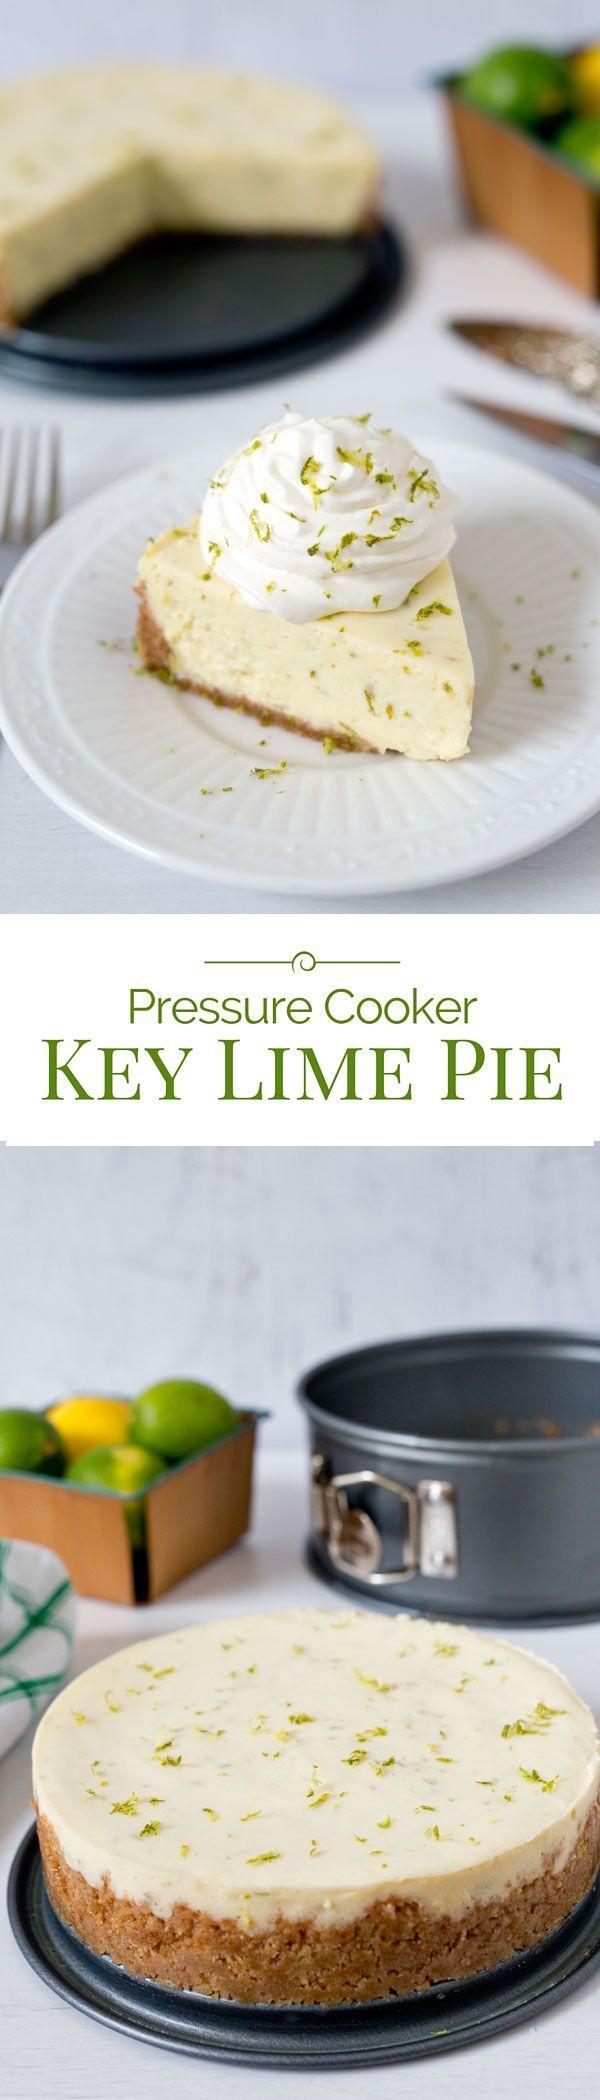 A tart, creamy key lime pie with a graham cracker crust